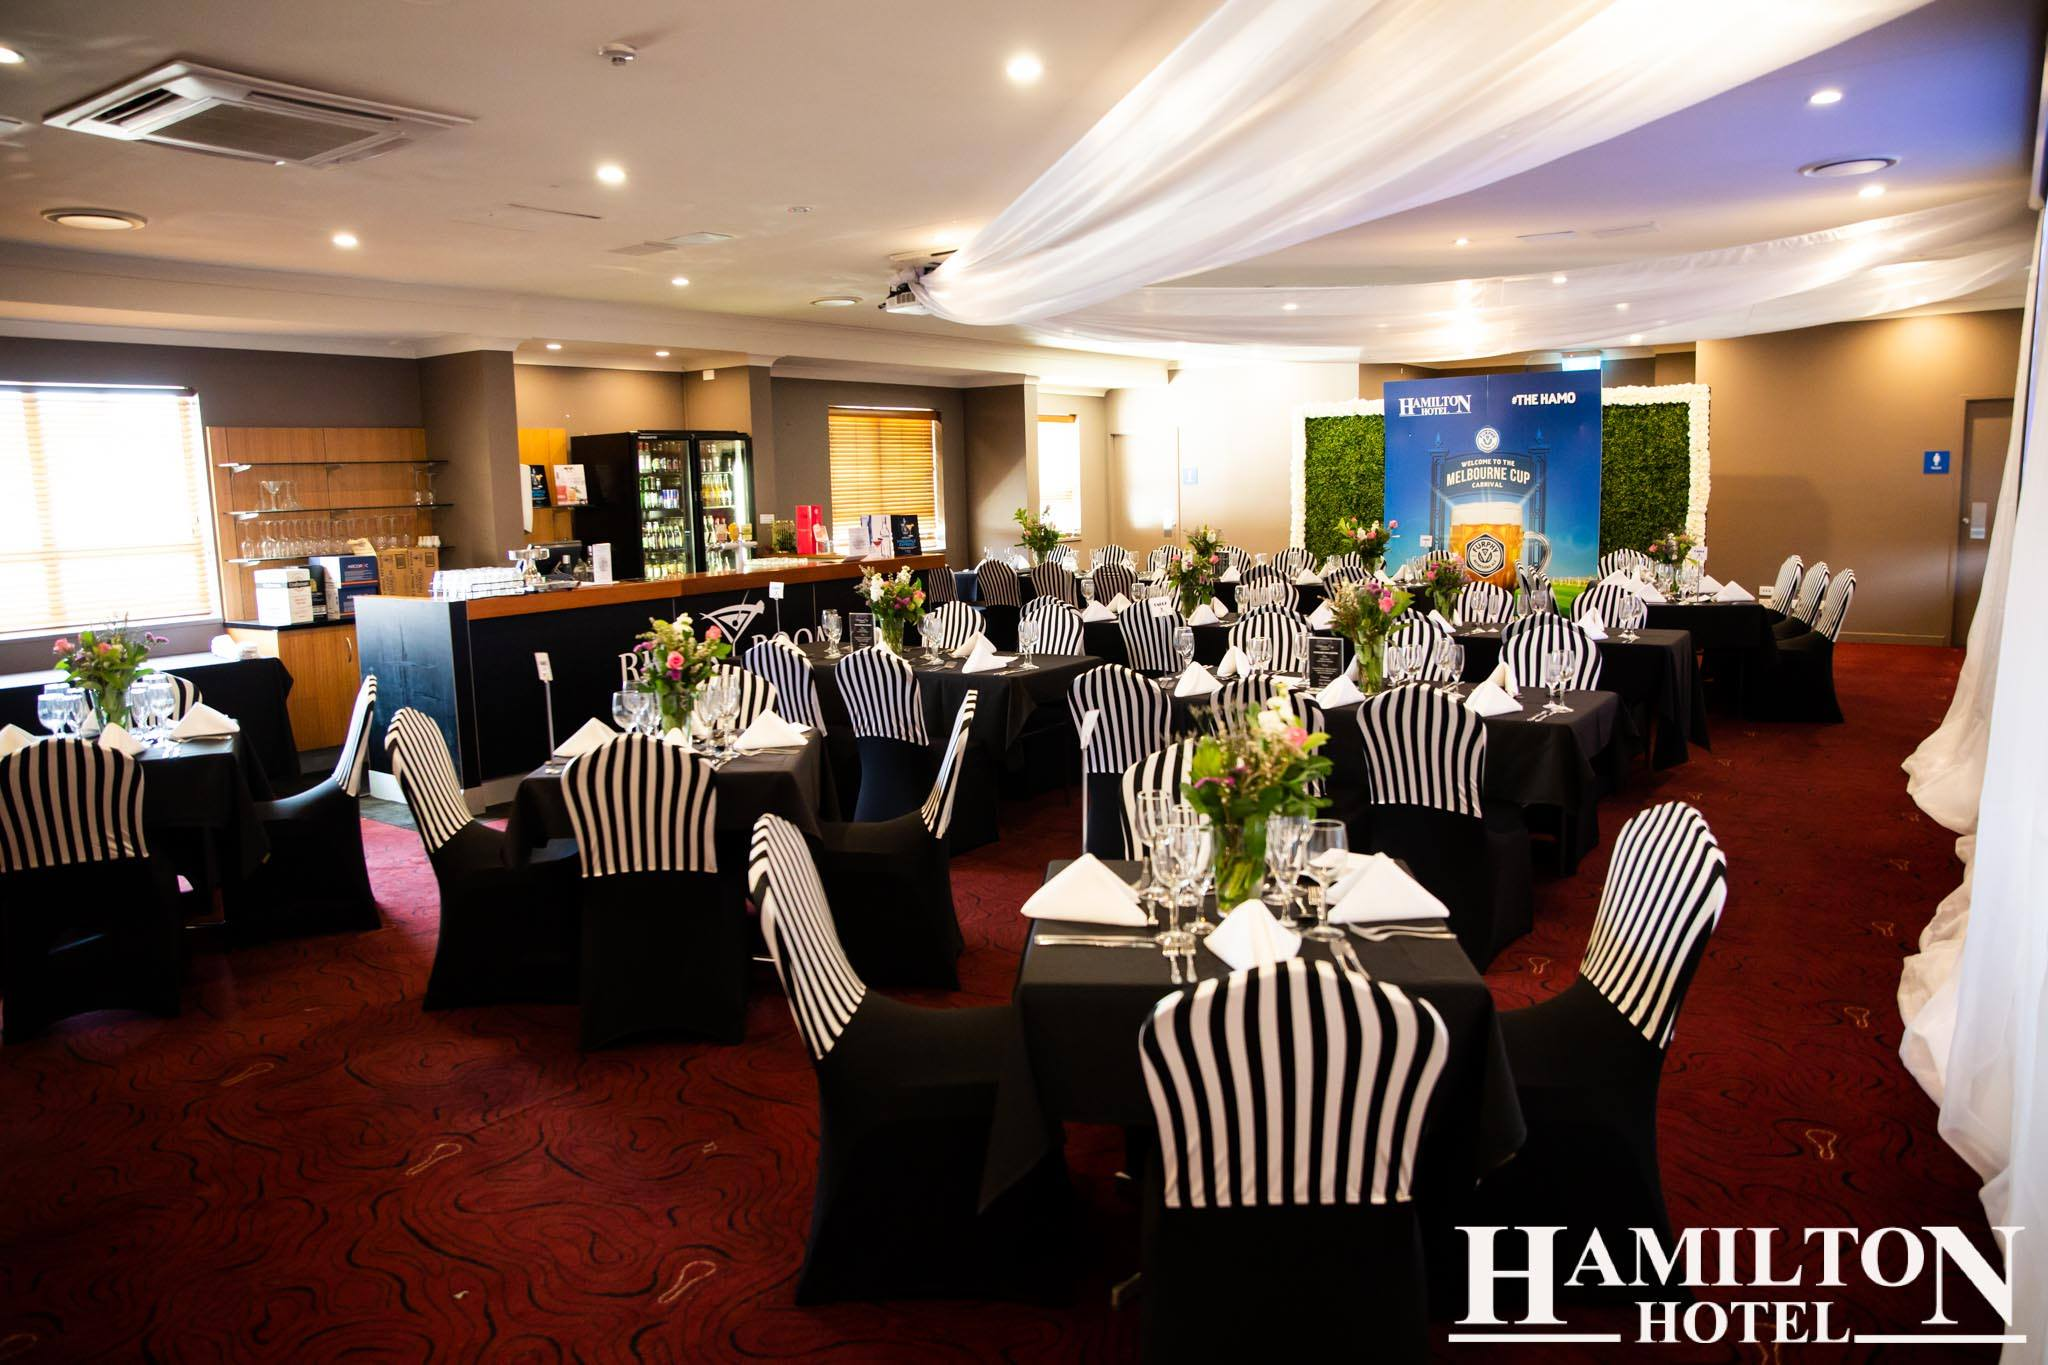 Melbourne-Cup-Hamilton-Hotel-Hamilton,QLD (2).jpg